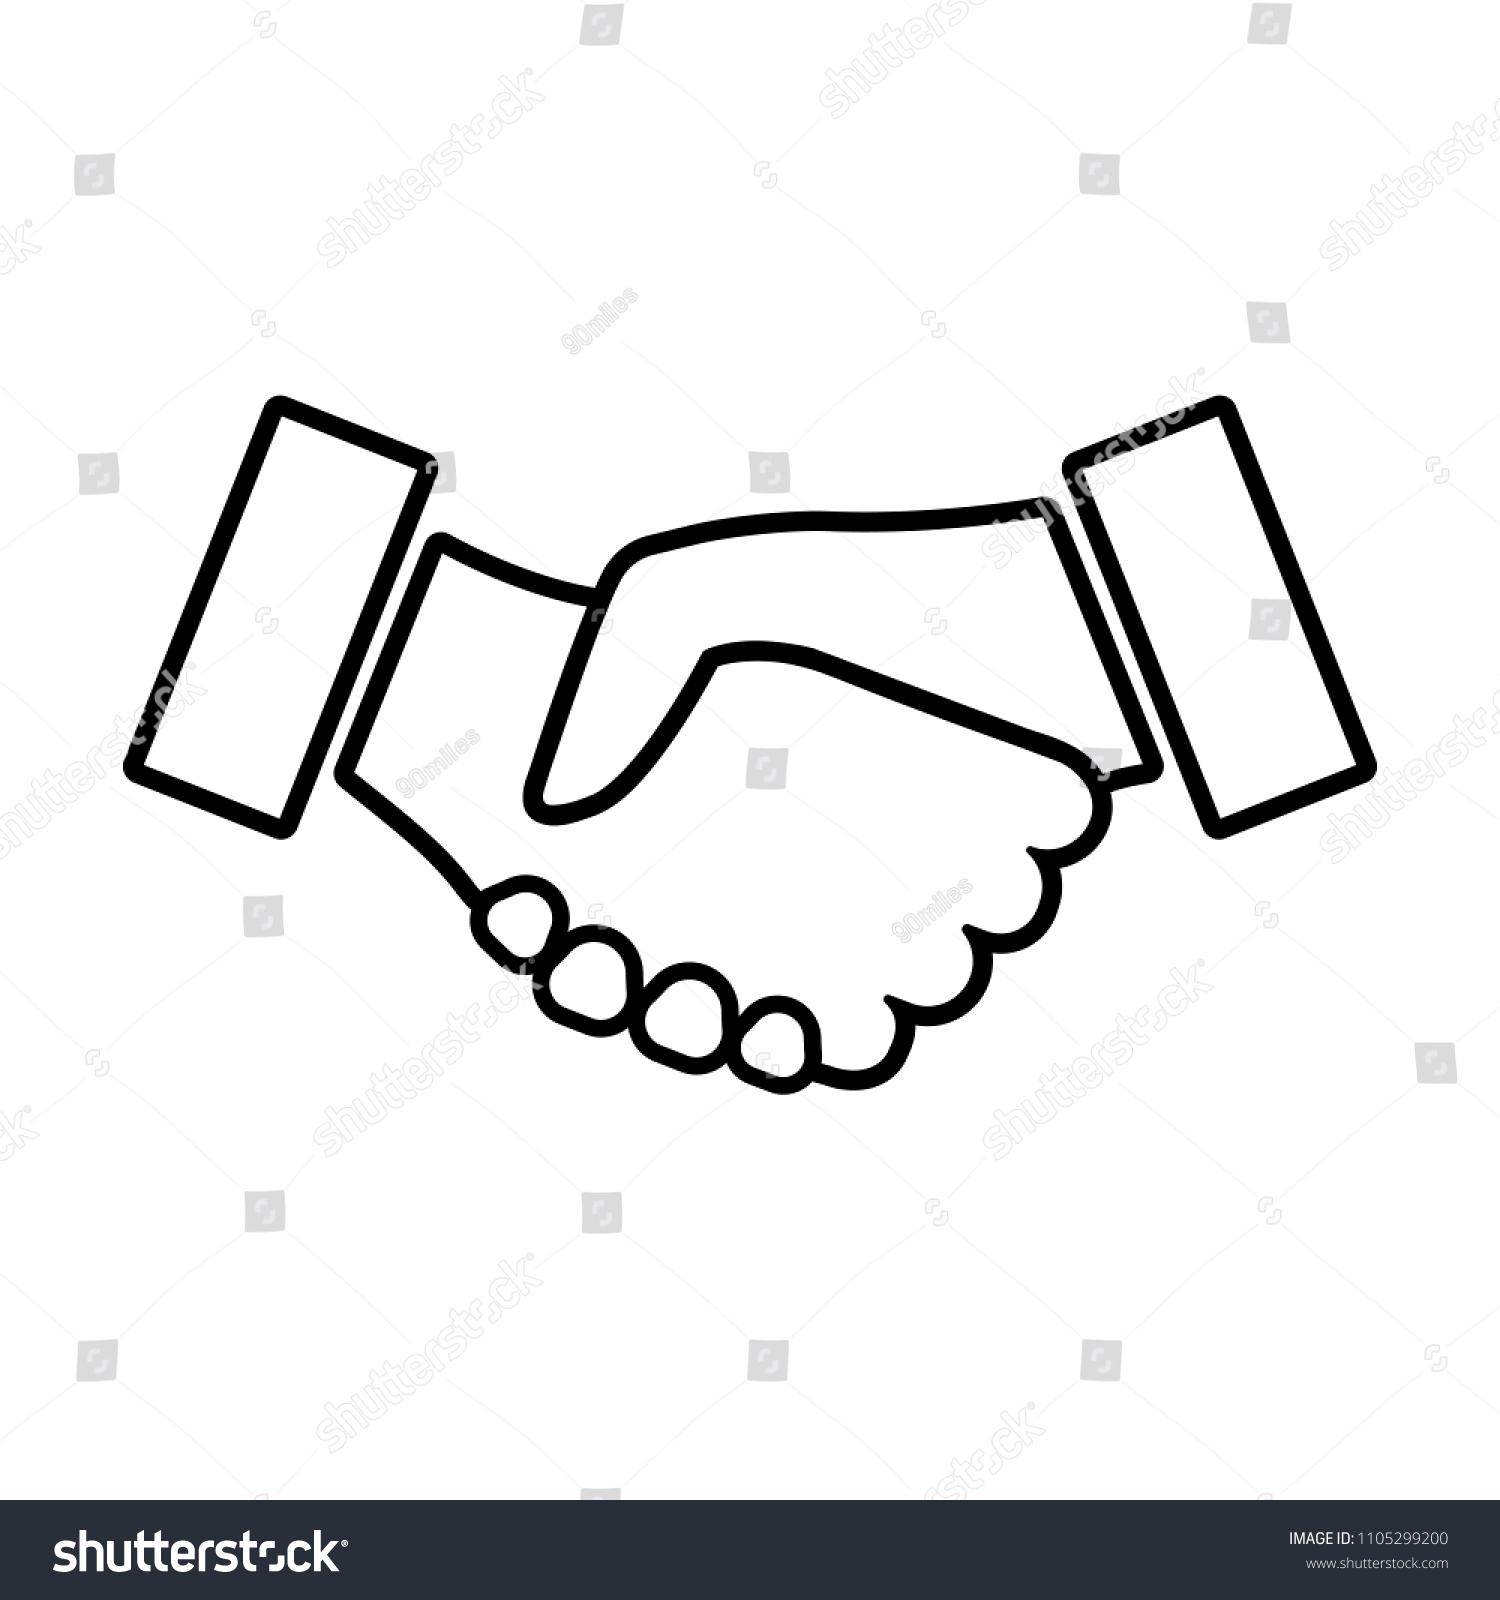 Handshake Line Icon Two Hands Shaking Stock Illustration 1105299200